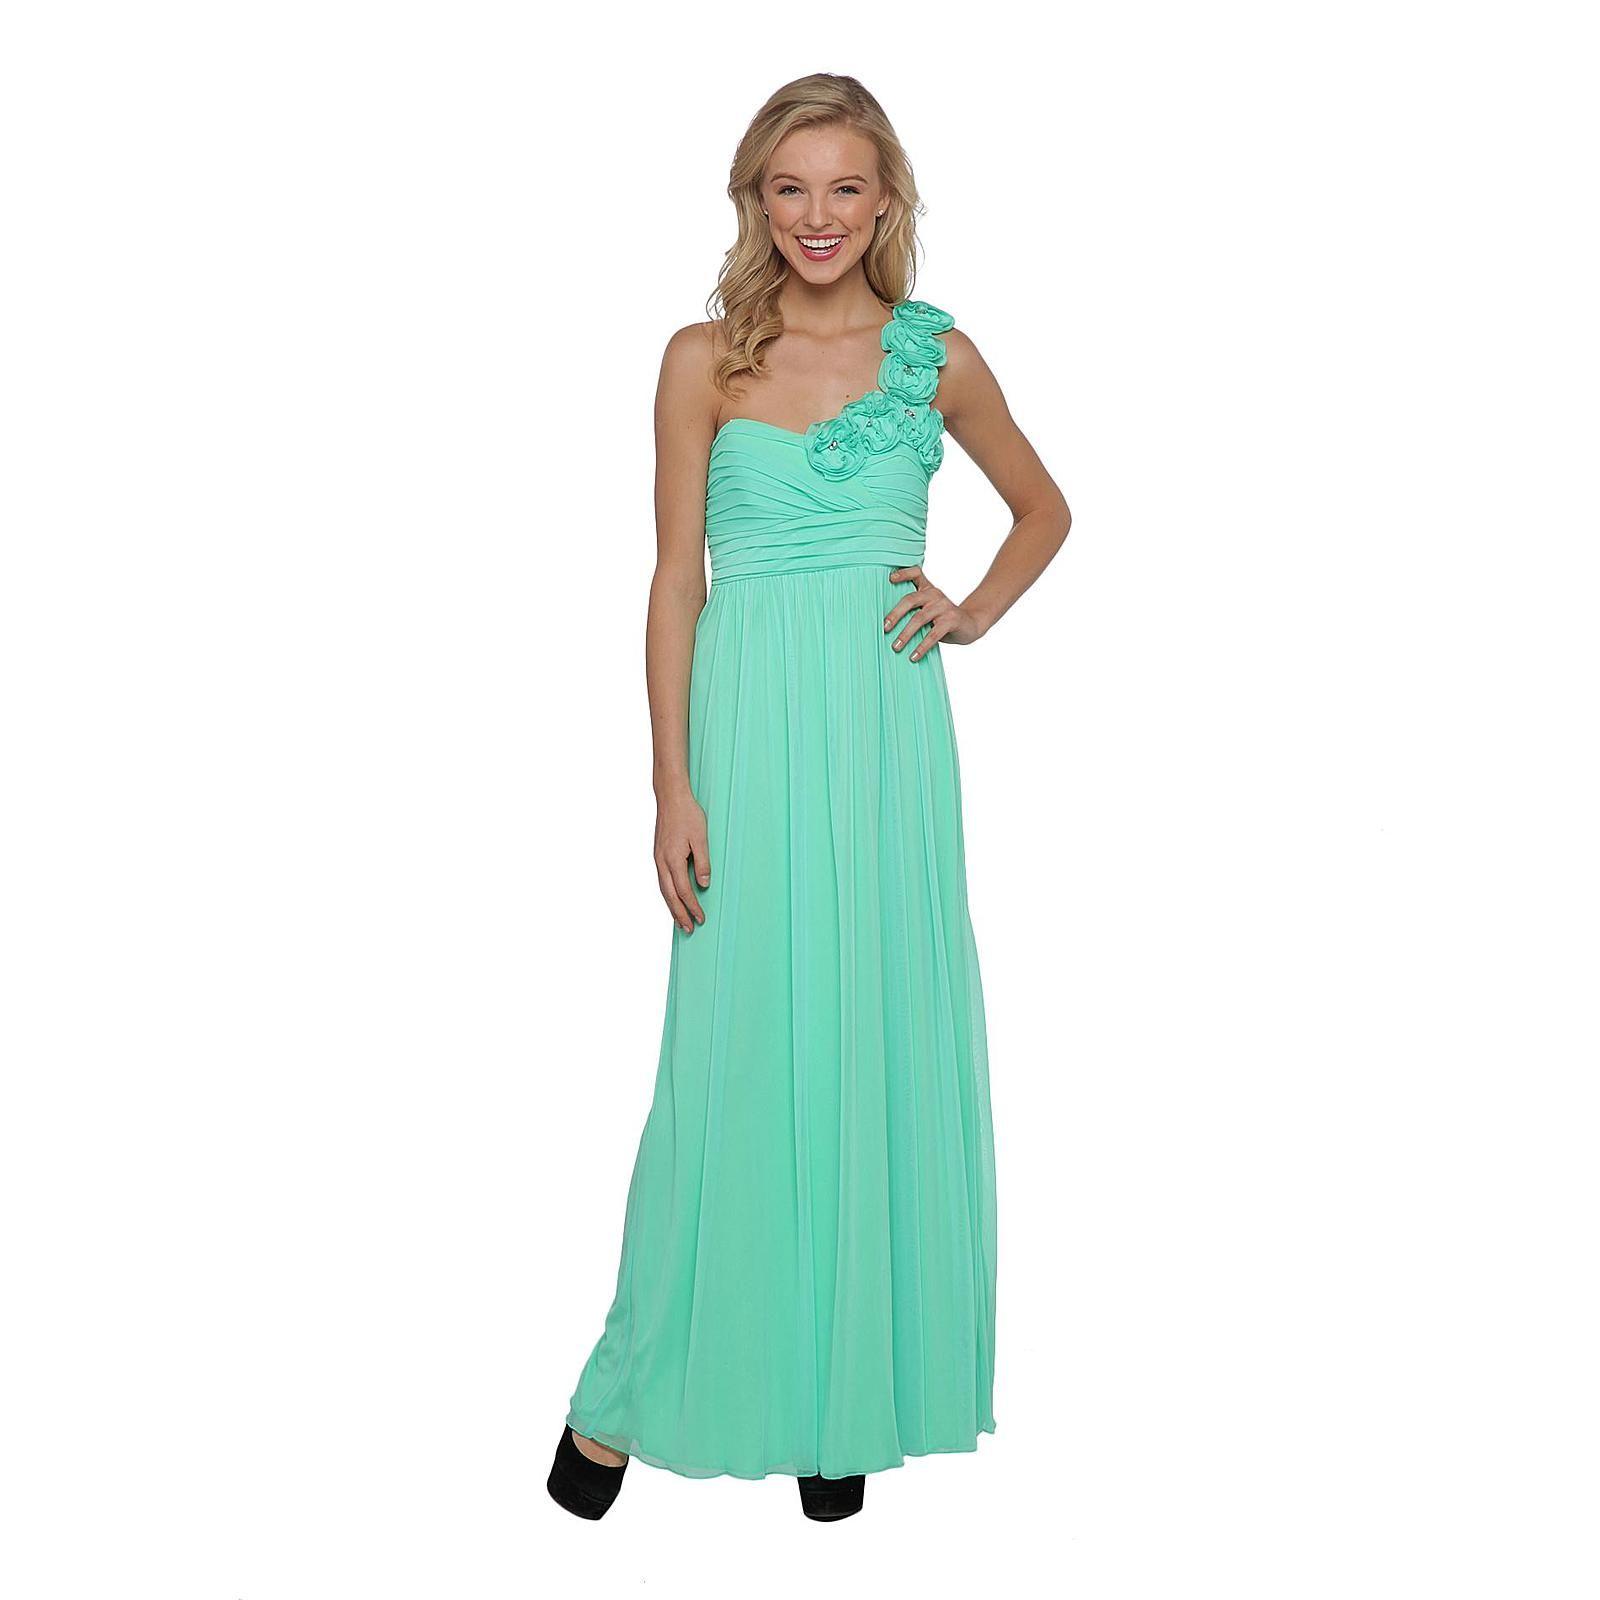 Makeup with mint green dress  Mint oneshoulder rosette prom dress arscity